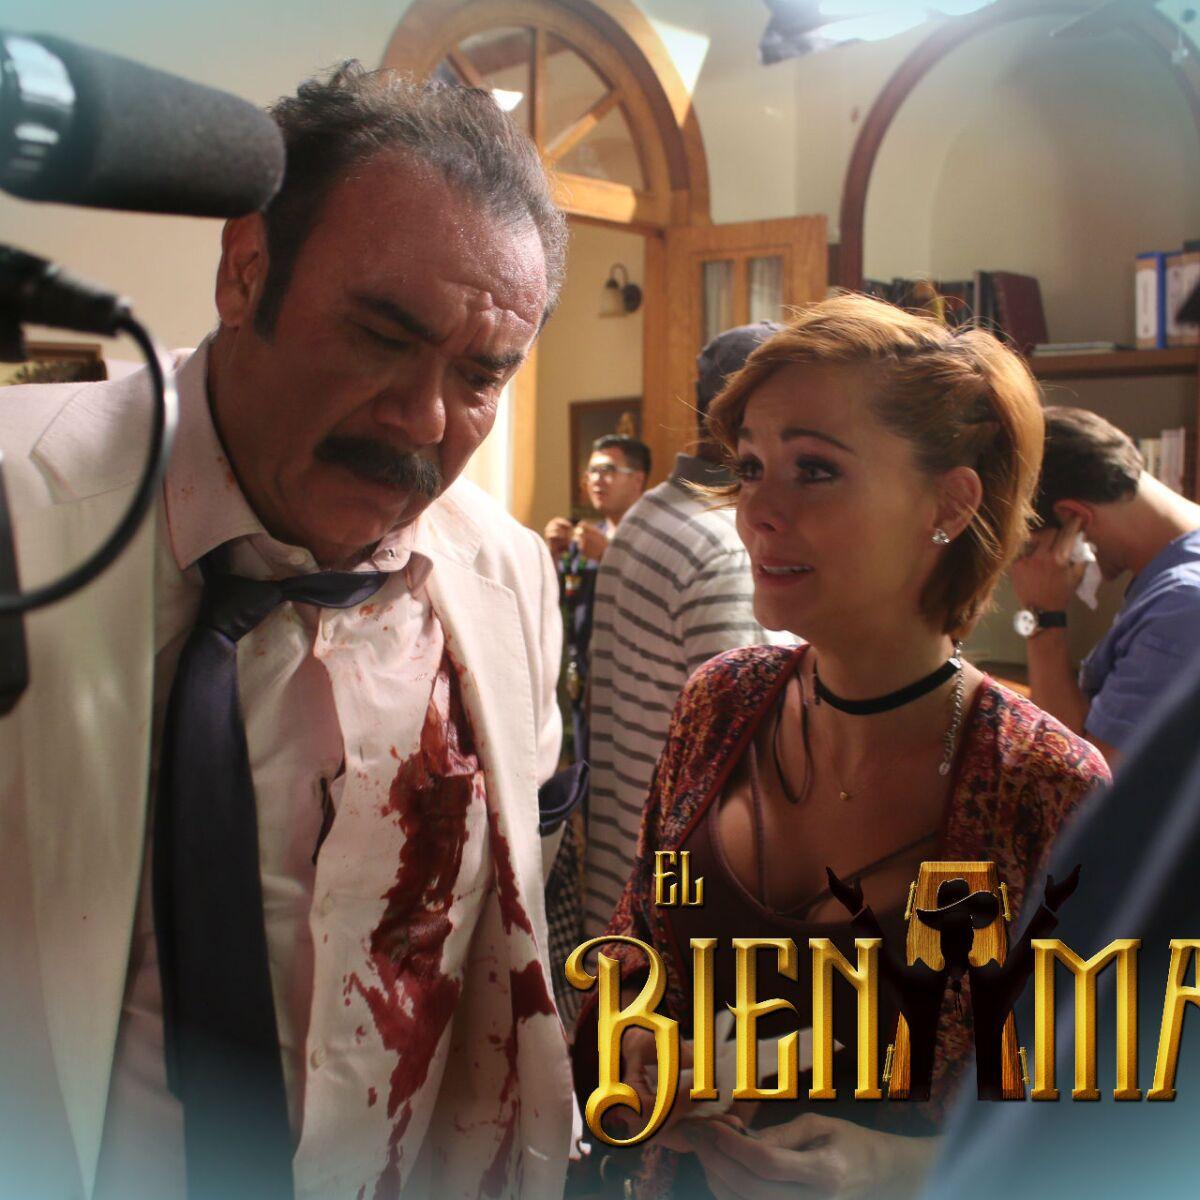 Amar A Muerte Capitulo 18: Detrás De Cámaras: ¡La Muerte De Odorico!